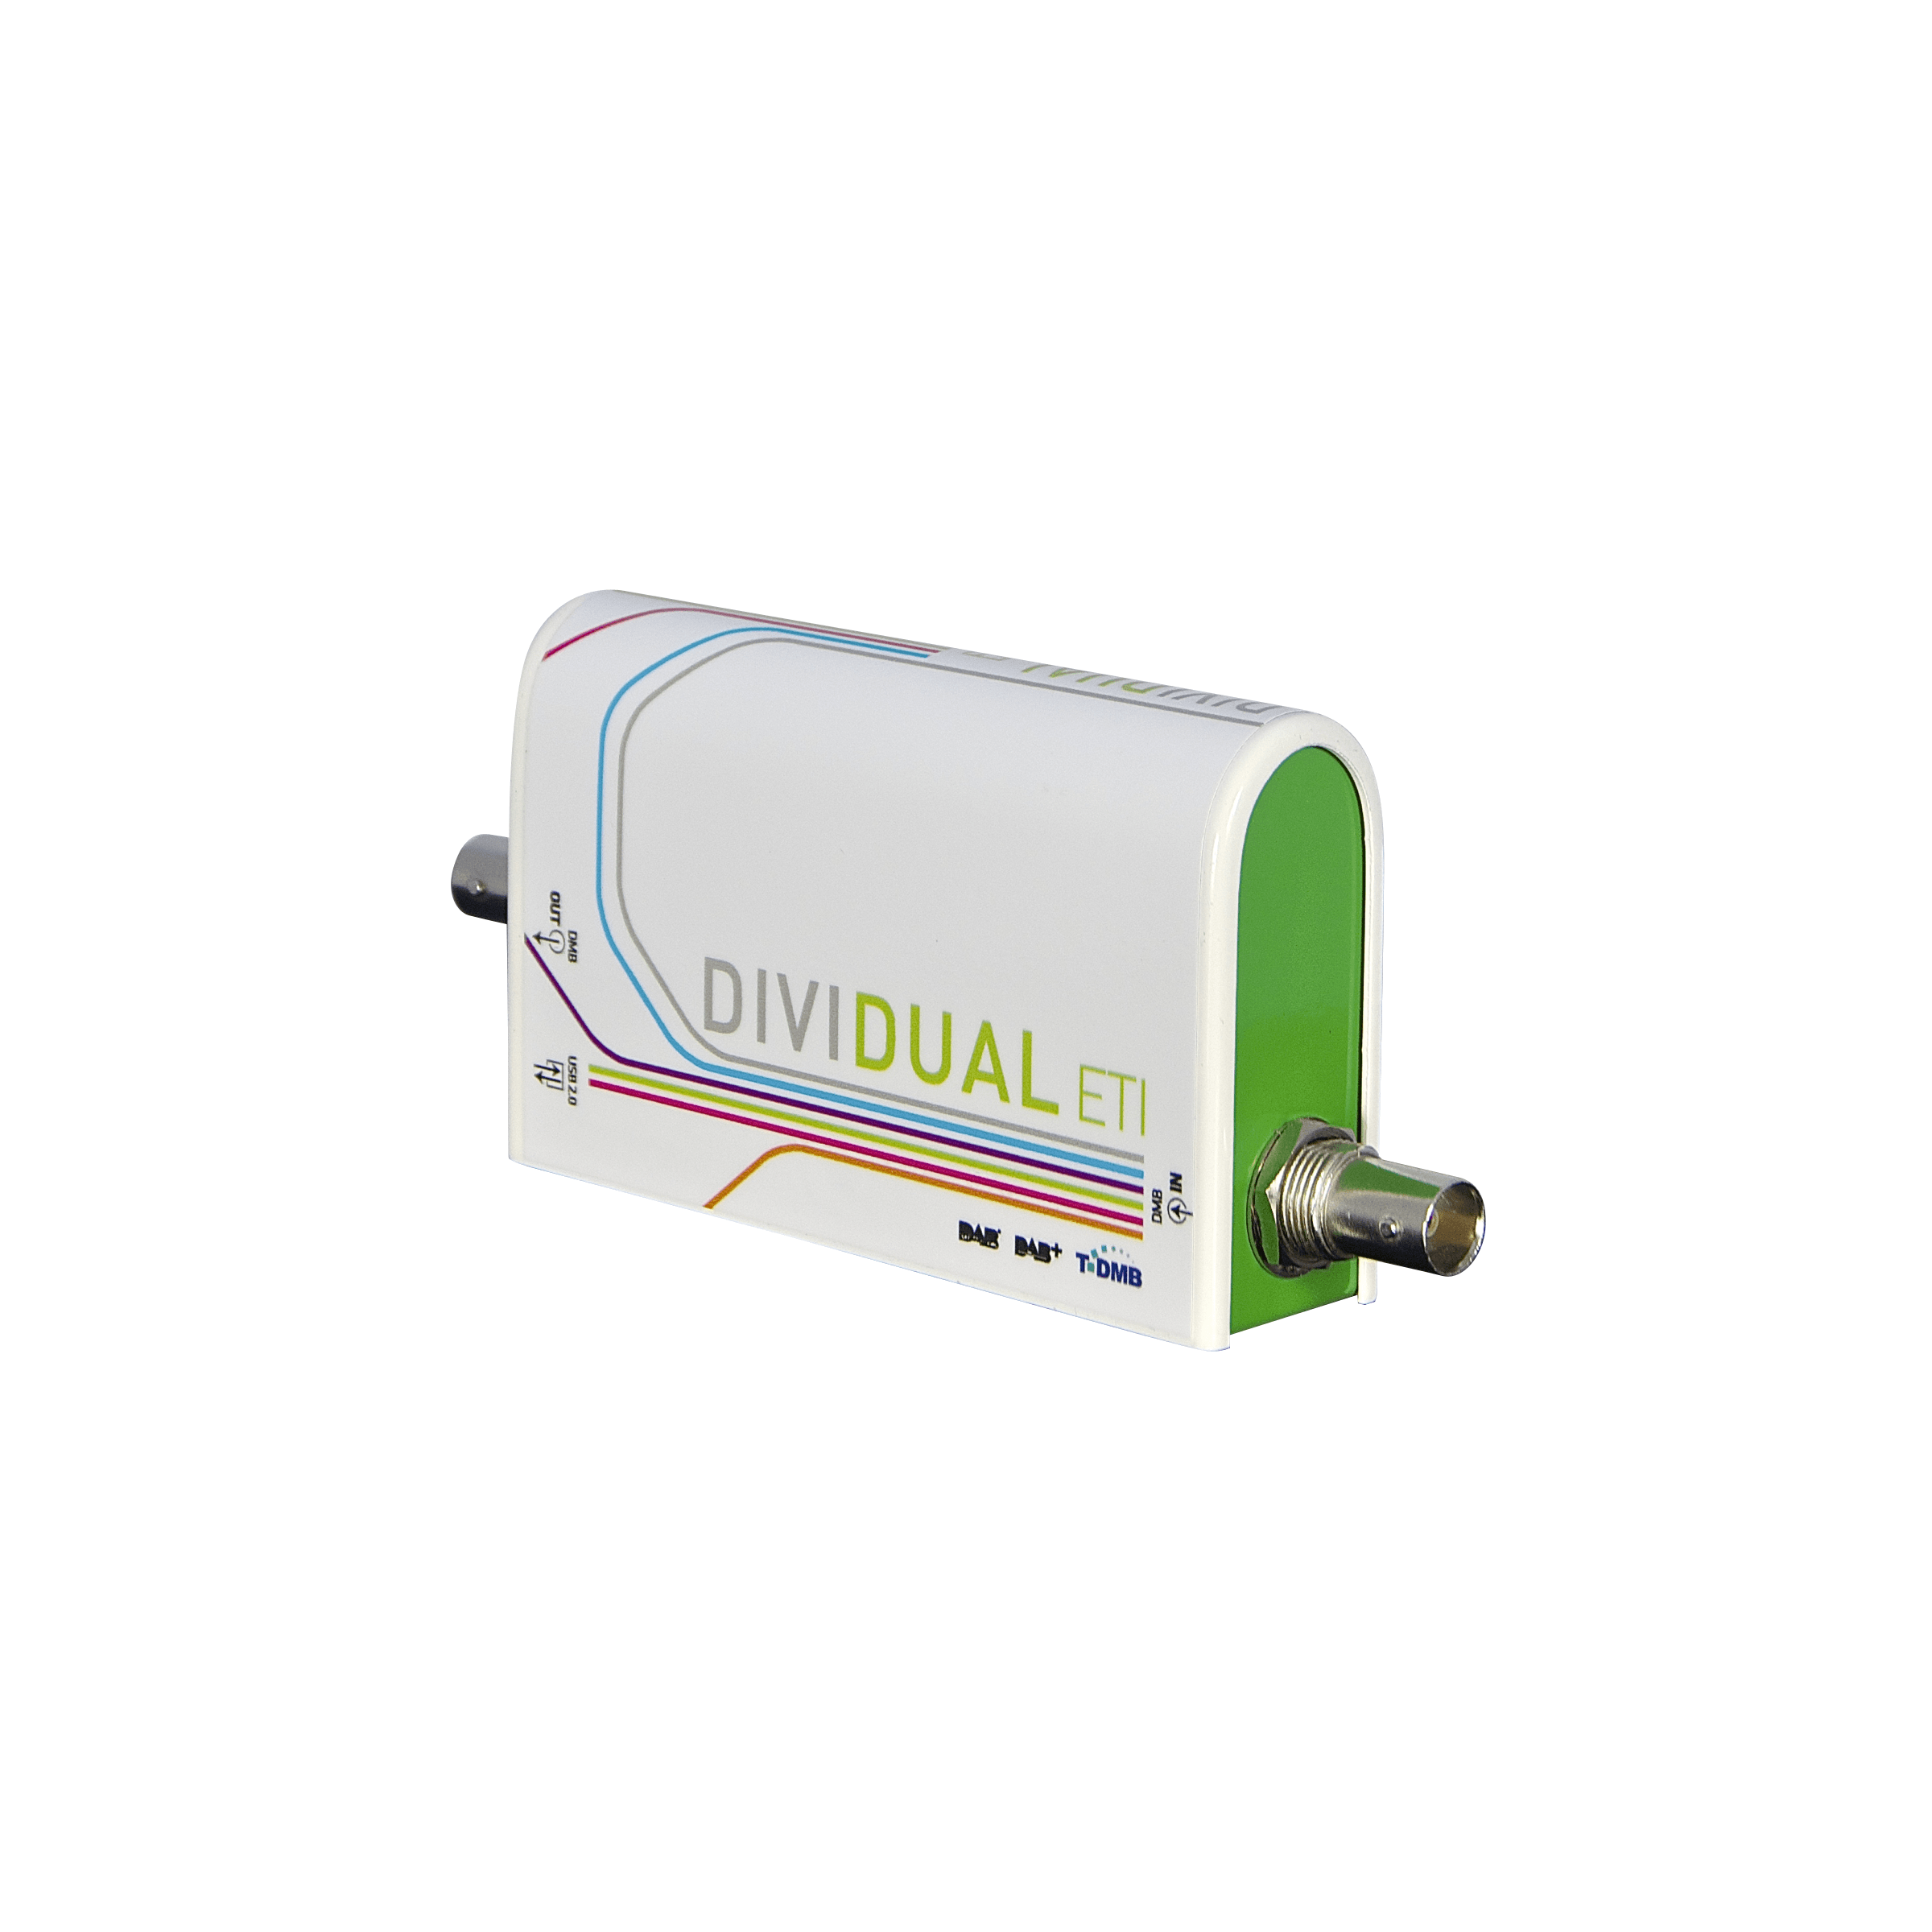 DiviDual ETI - Baseband ETI Recorder & Player